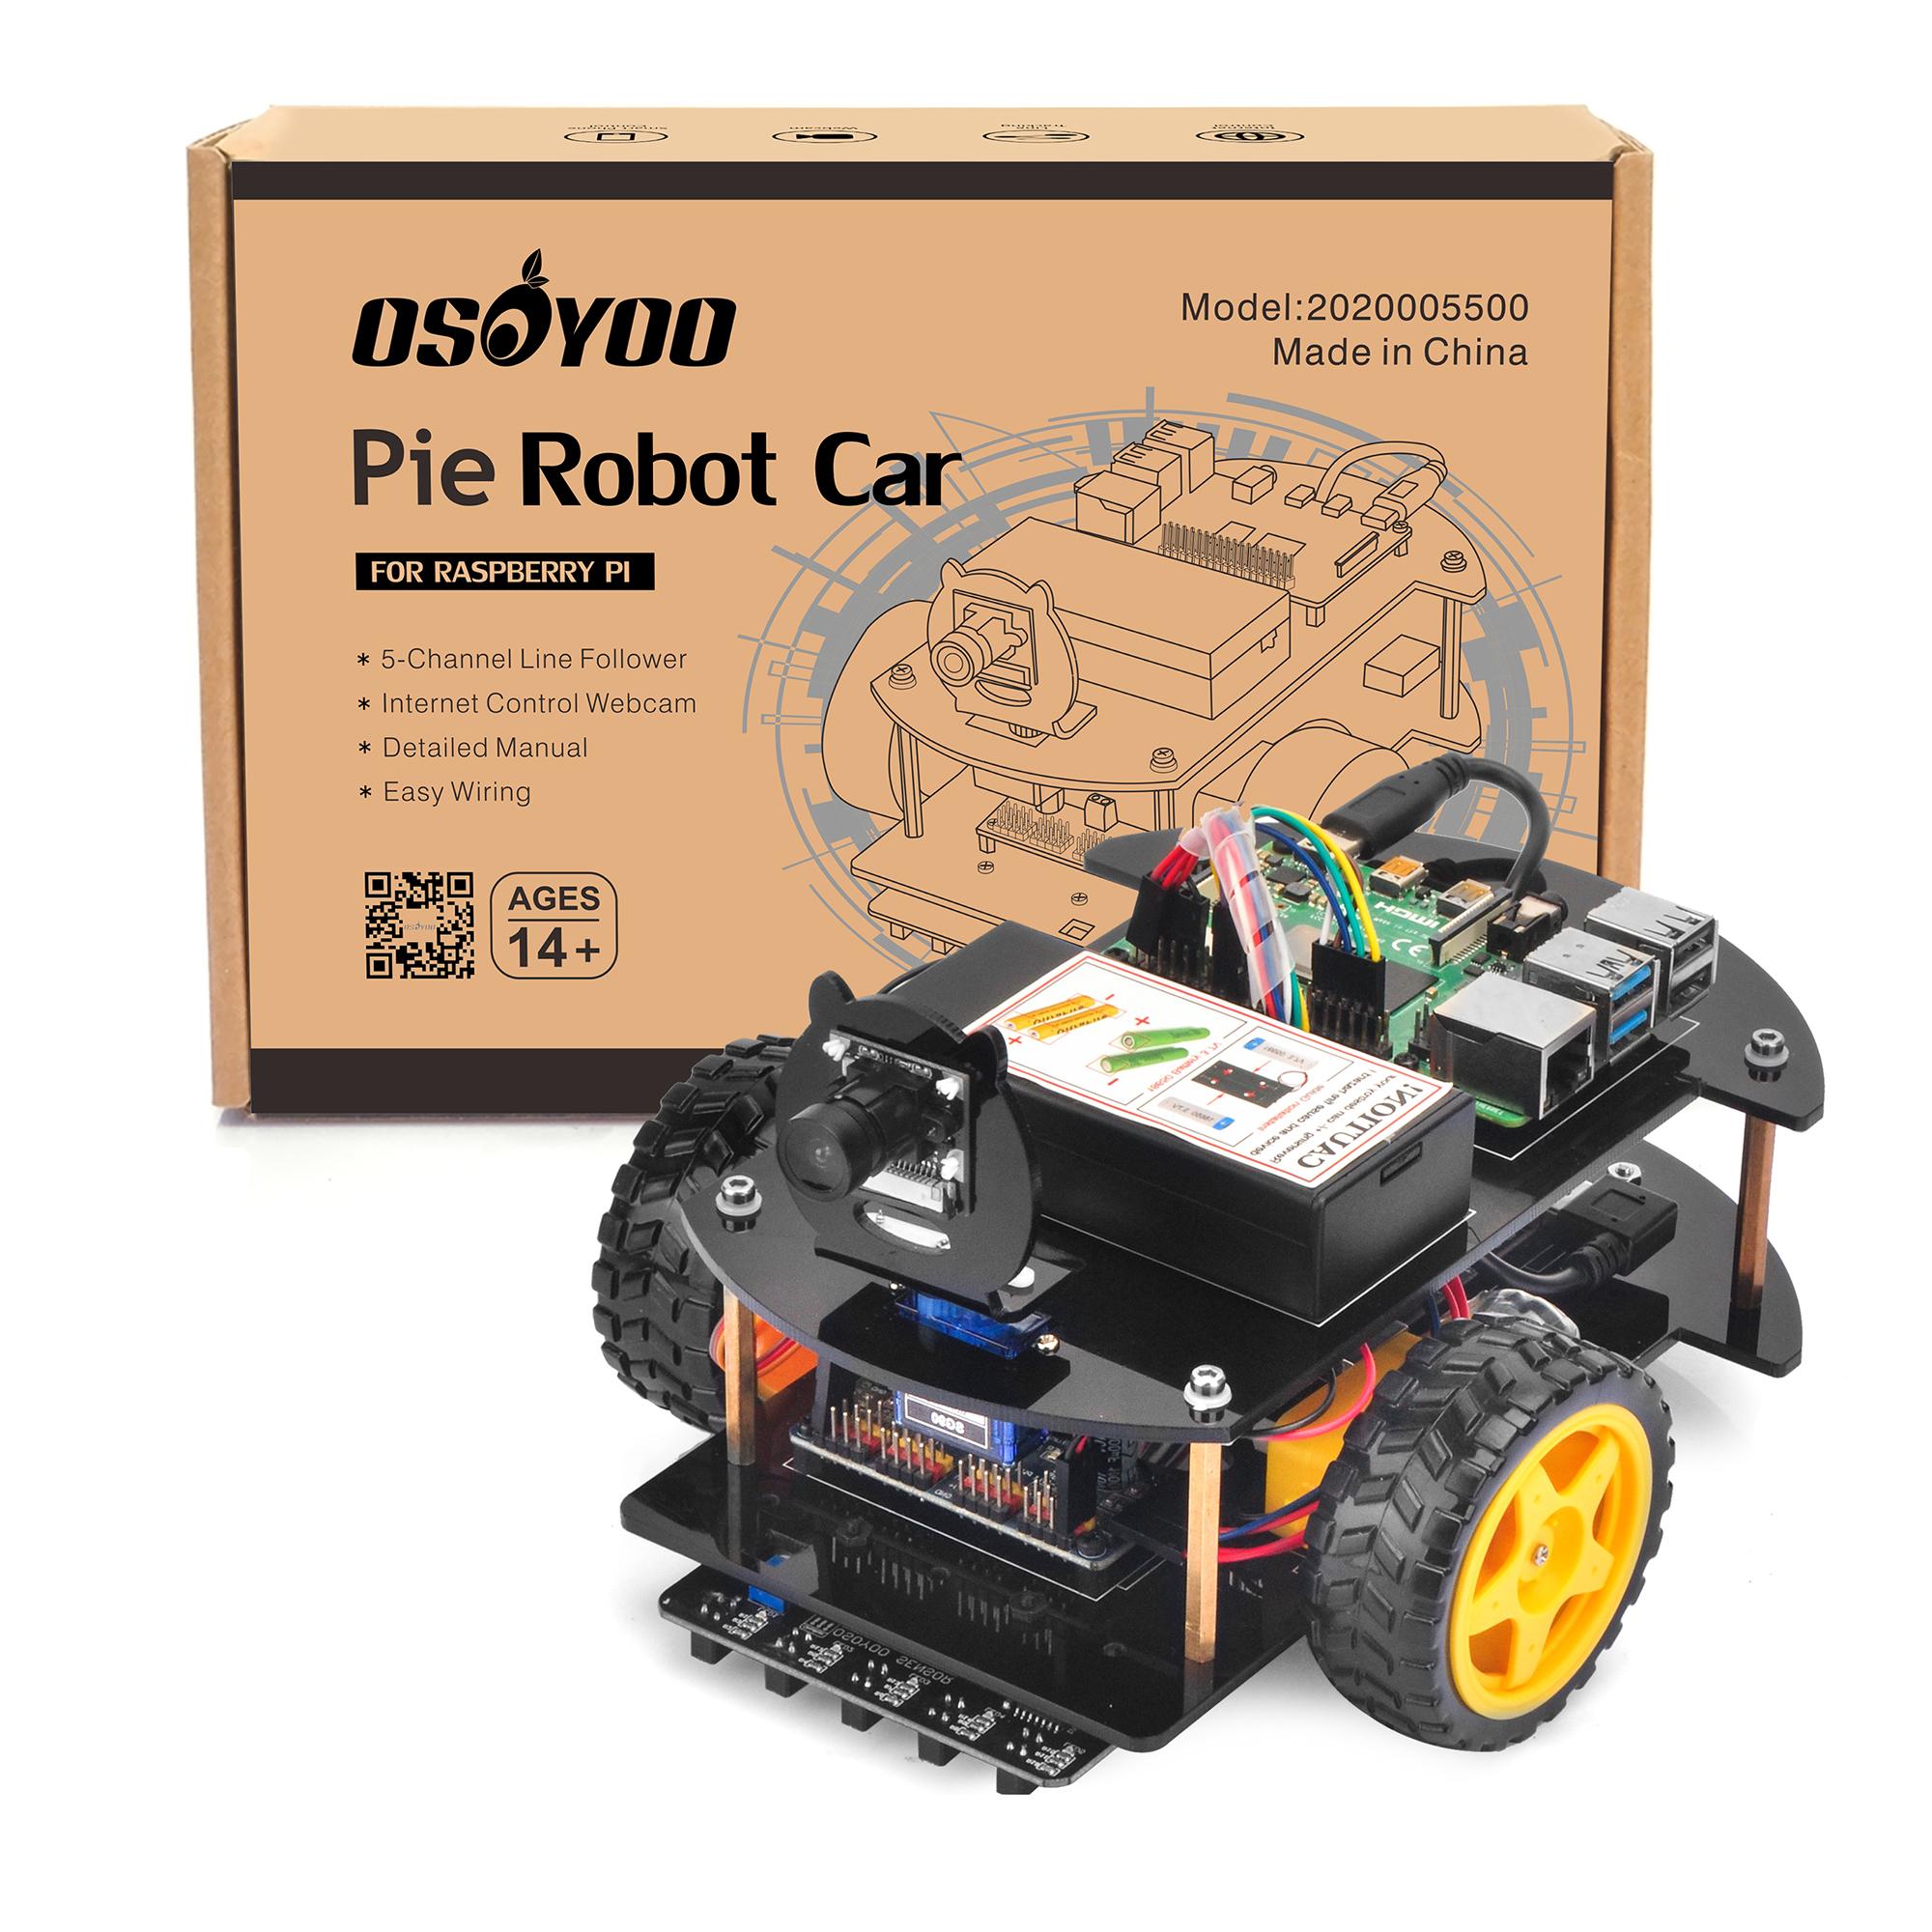 OSOYOO Raspberry Pi V2.0 Car Introduction Model#2020005500